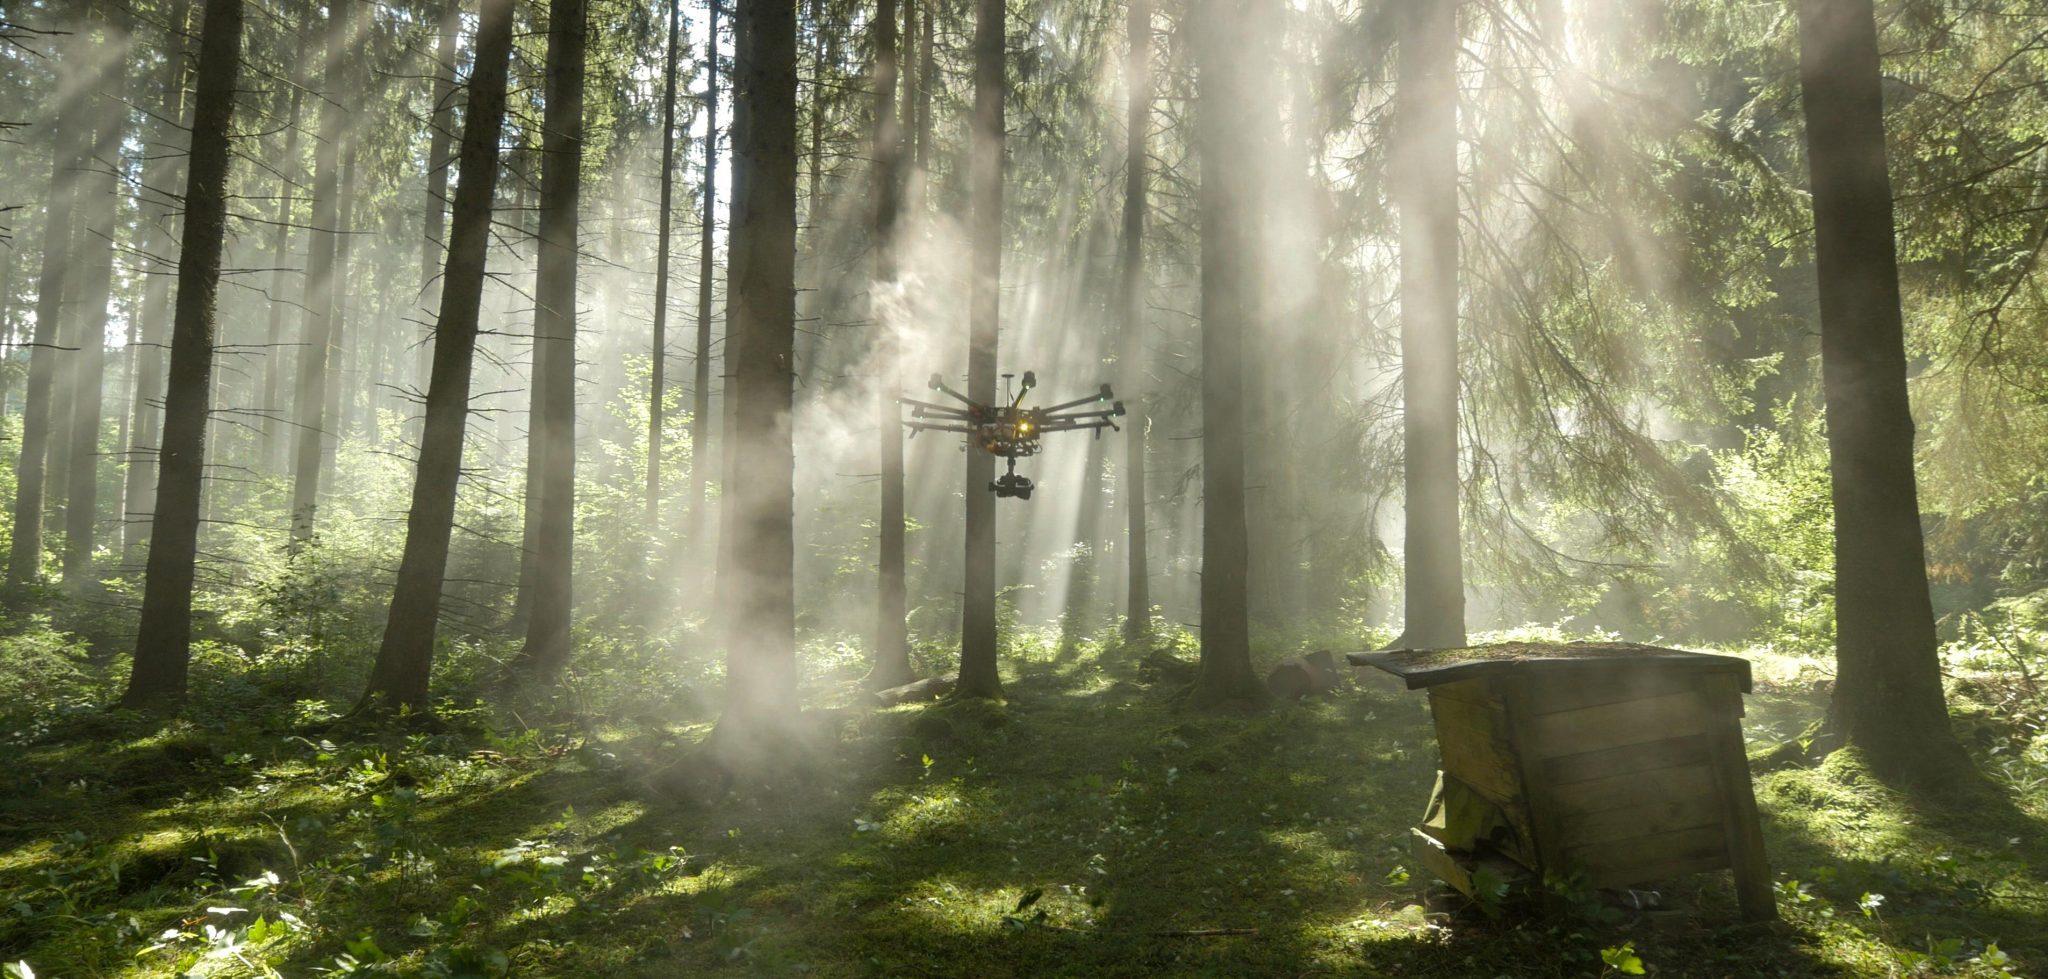 professionelle luftaufnahmen Nürburgring Drohne